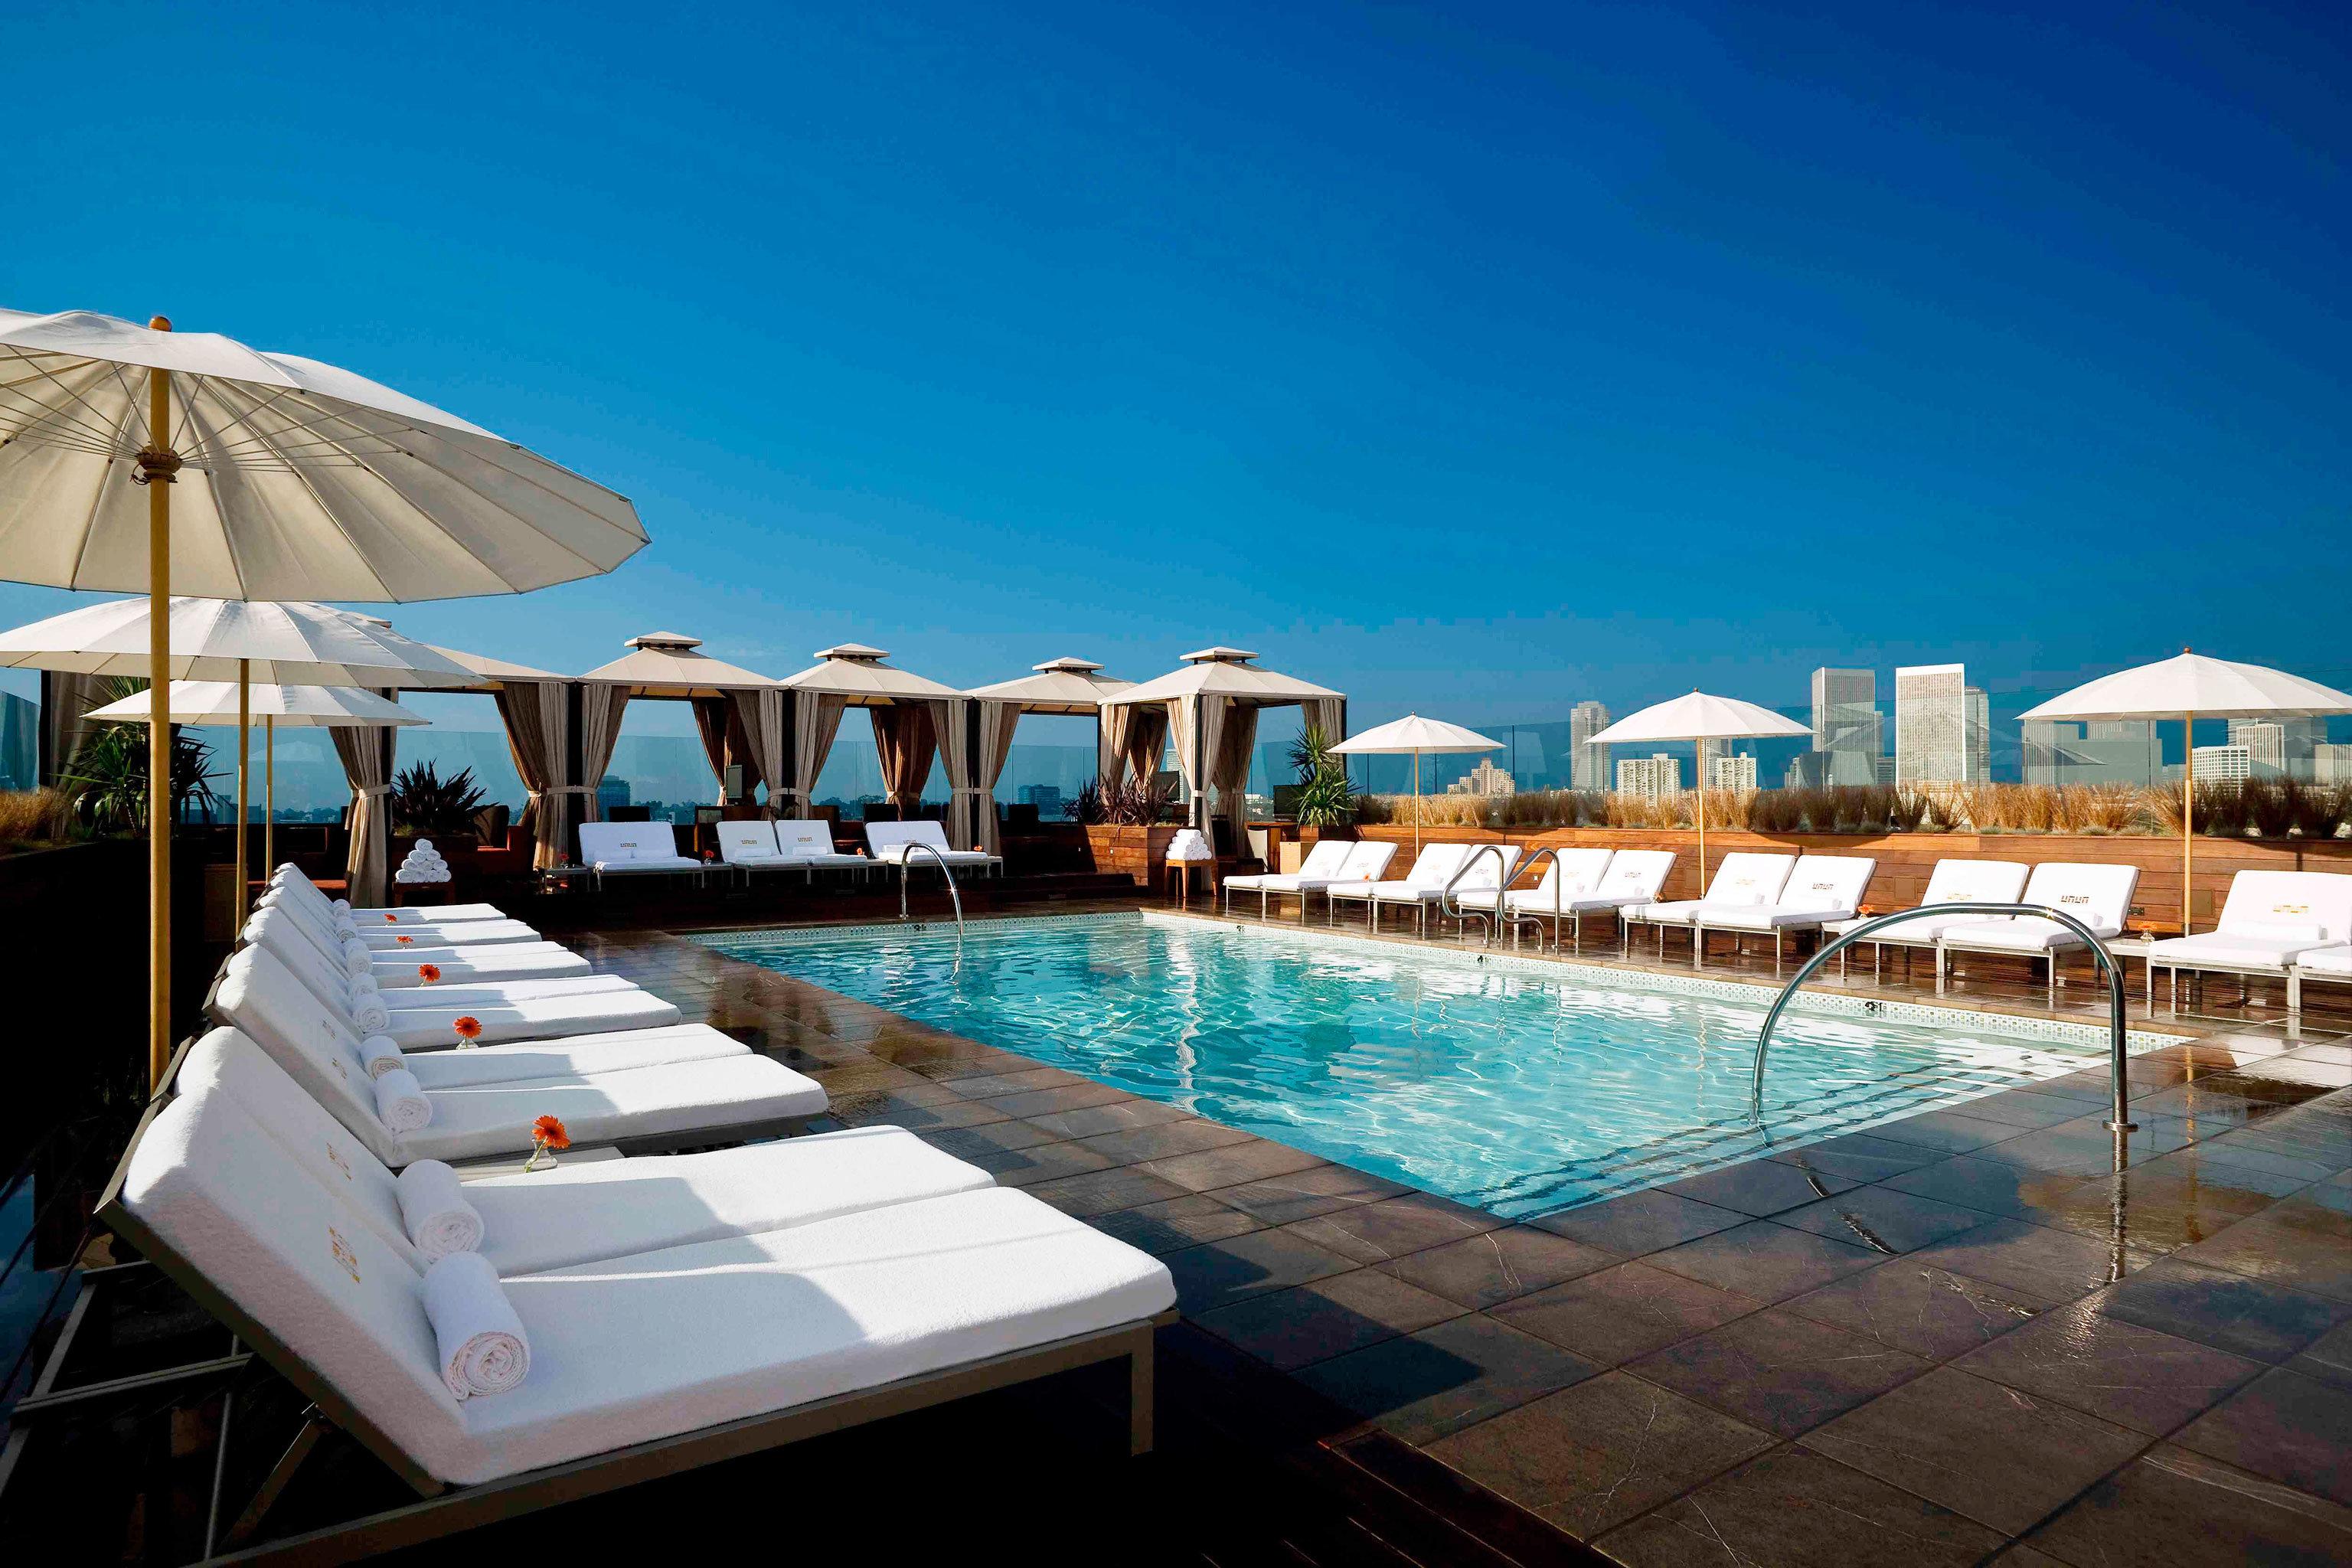 Hip Hotels Modern Nightlife Party Pool Rooftop umbrella chair leisure swimming pool property Resort marina dock Villa caribbean swimming